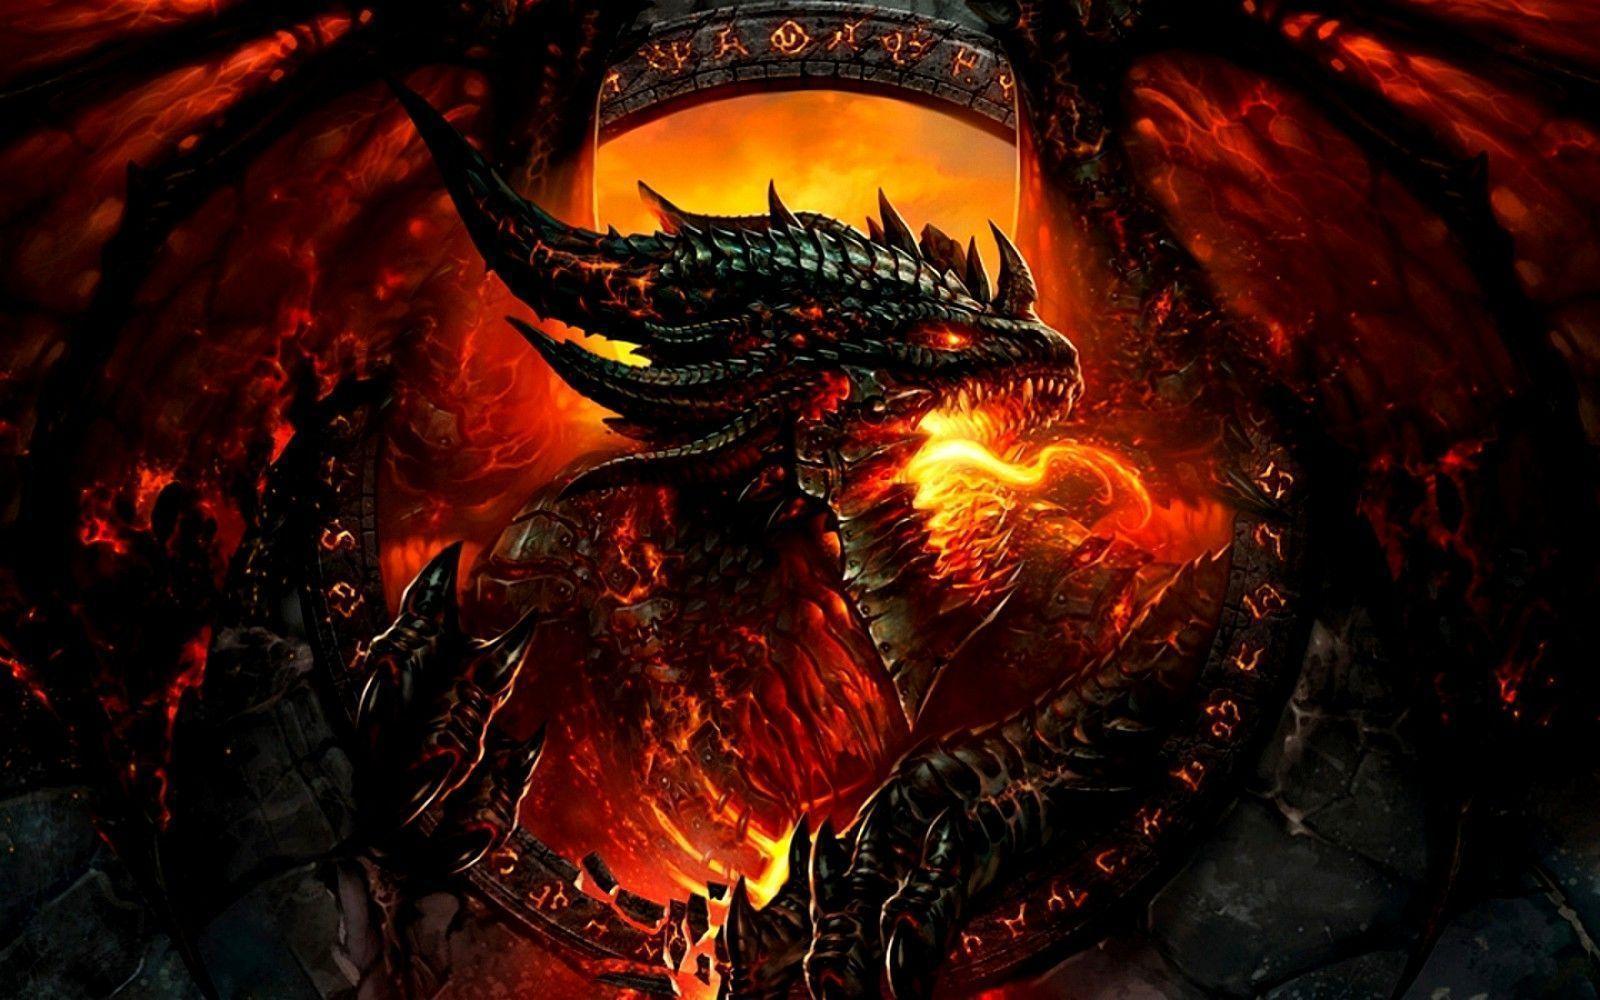 3D Dragon Wallpaper Hd Wallpapers Gallery 1600x1000